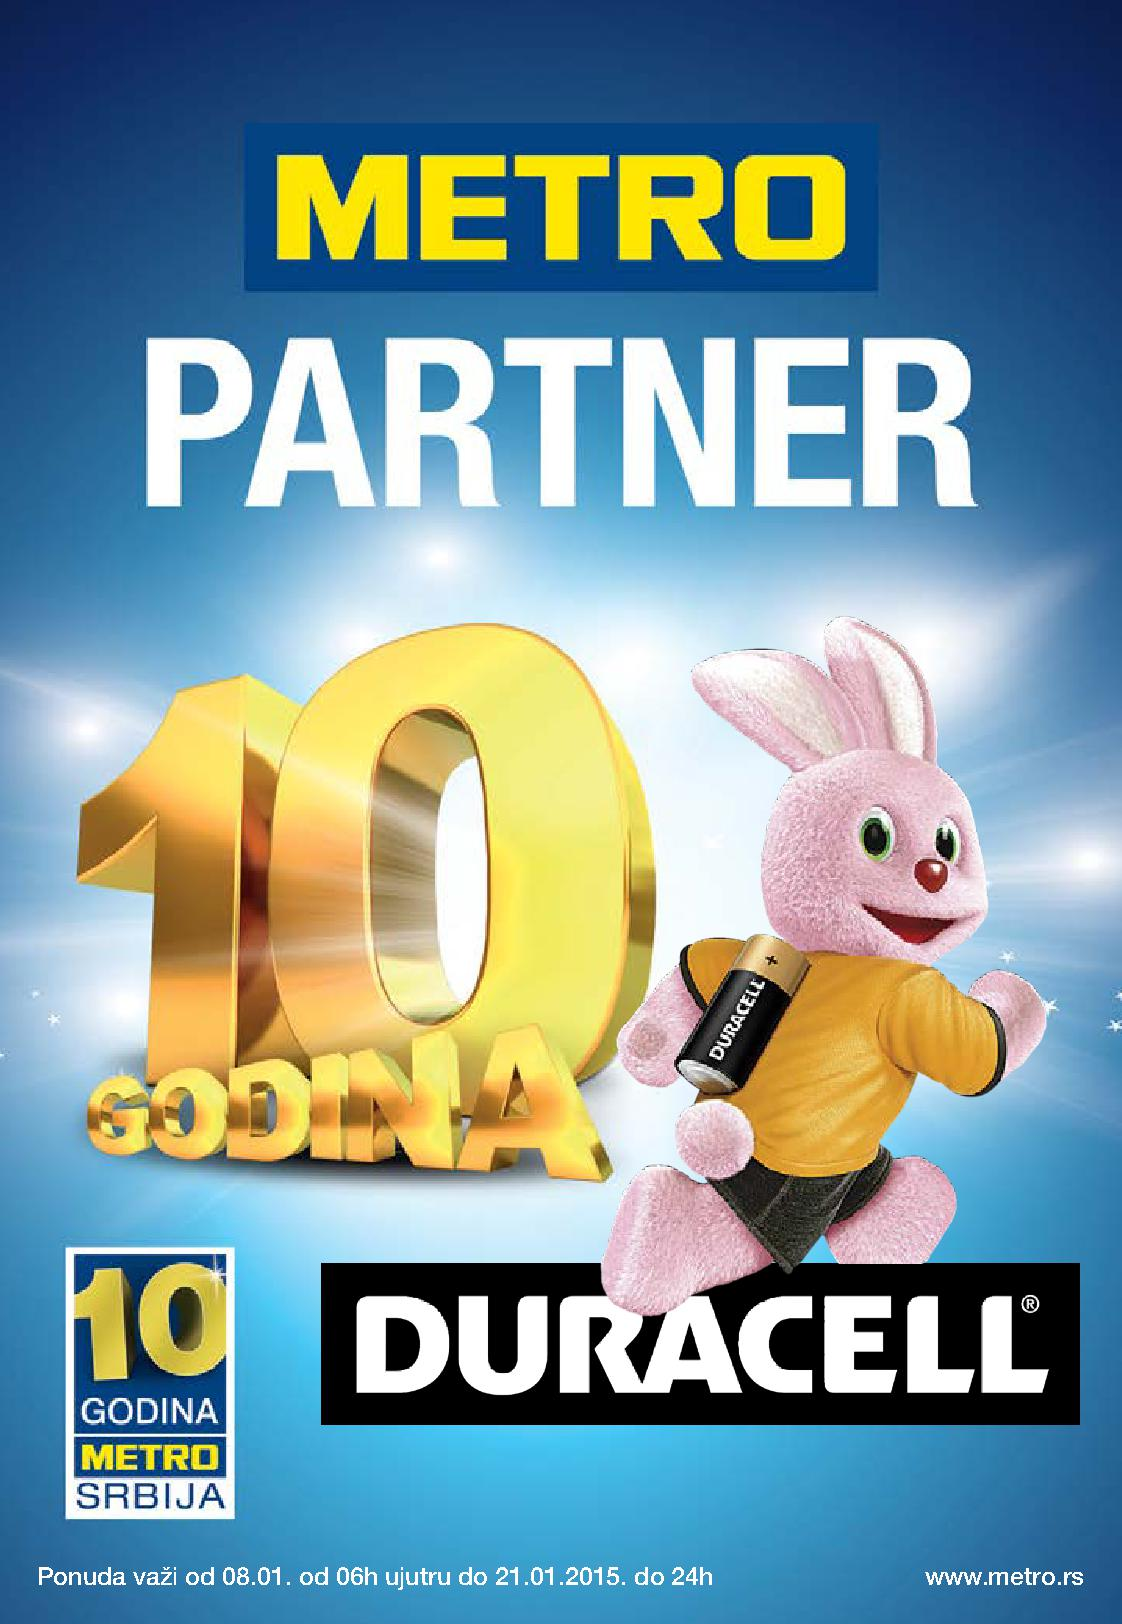 Metro akcija Duracell proizvoda